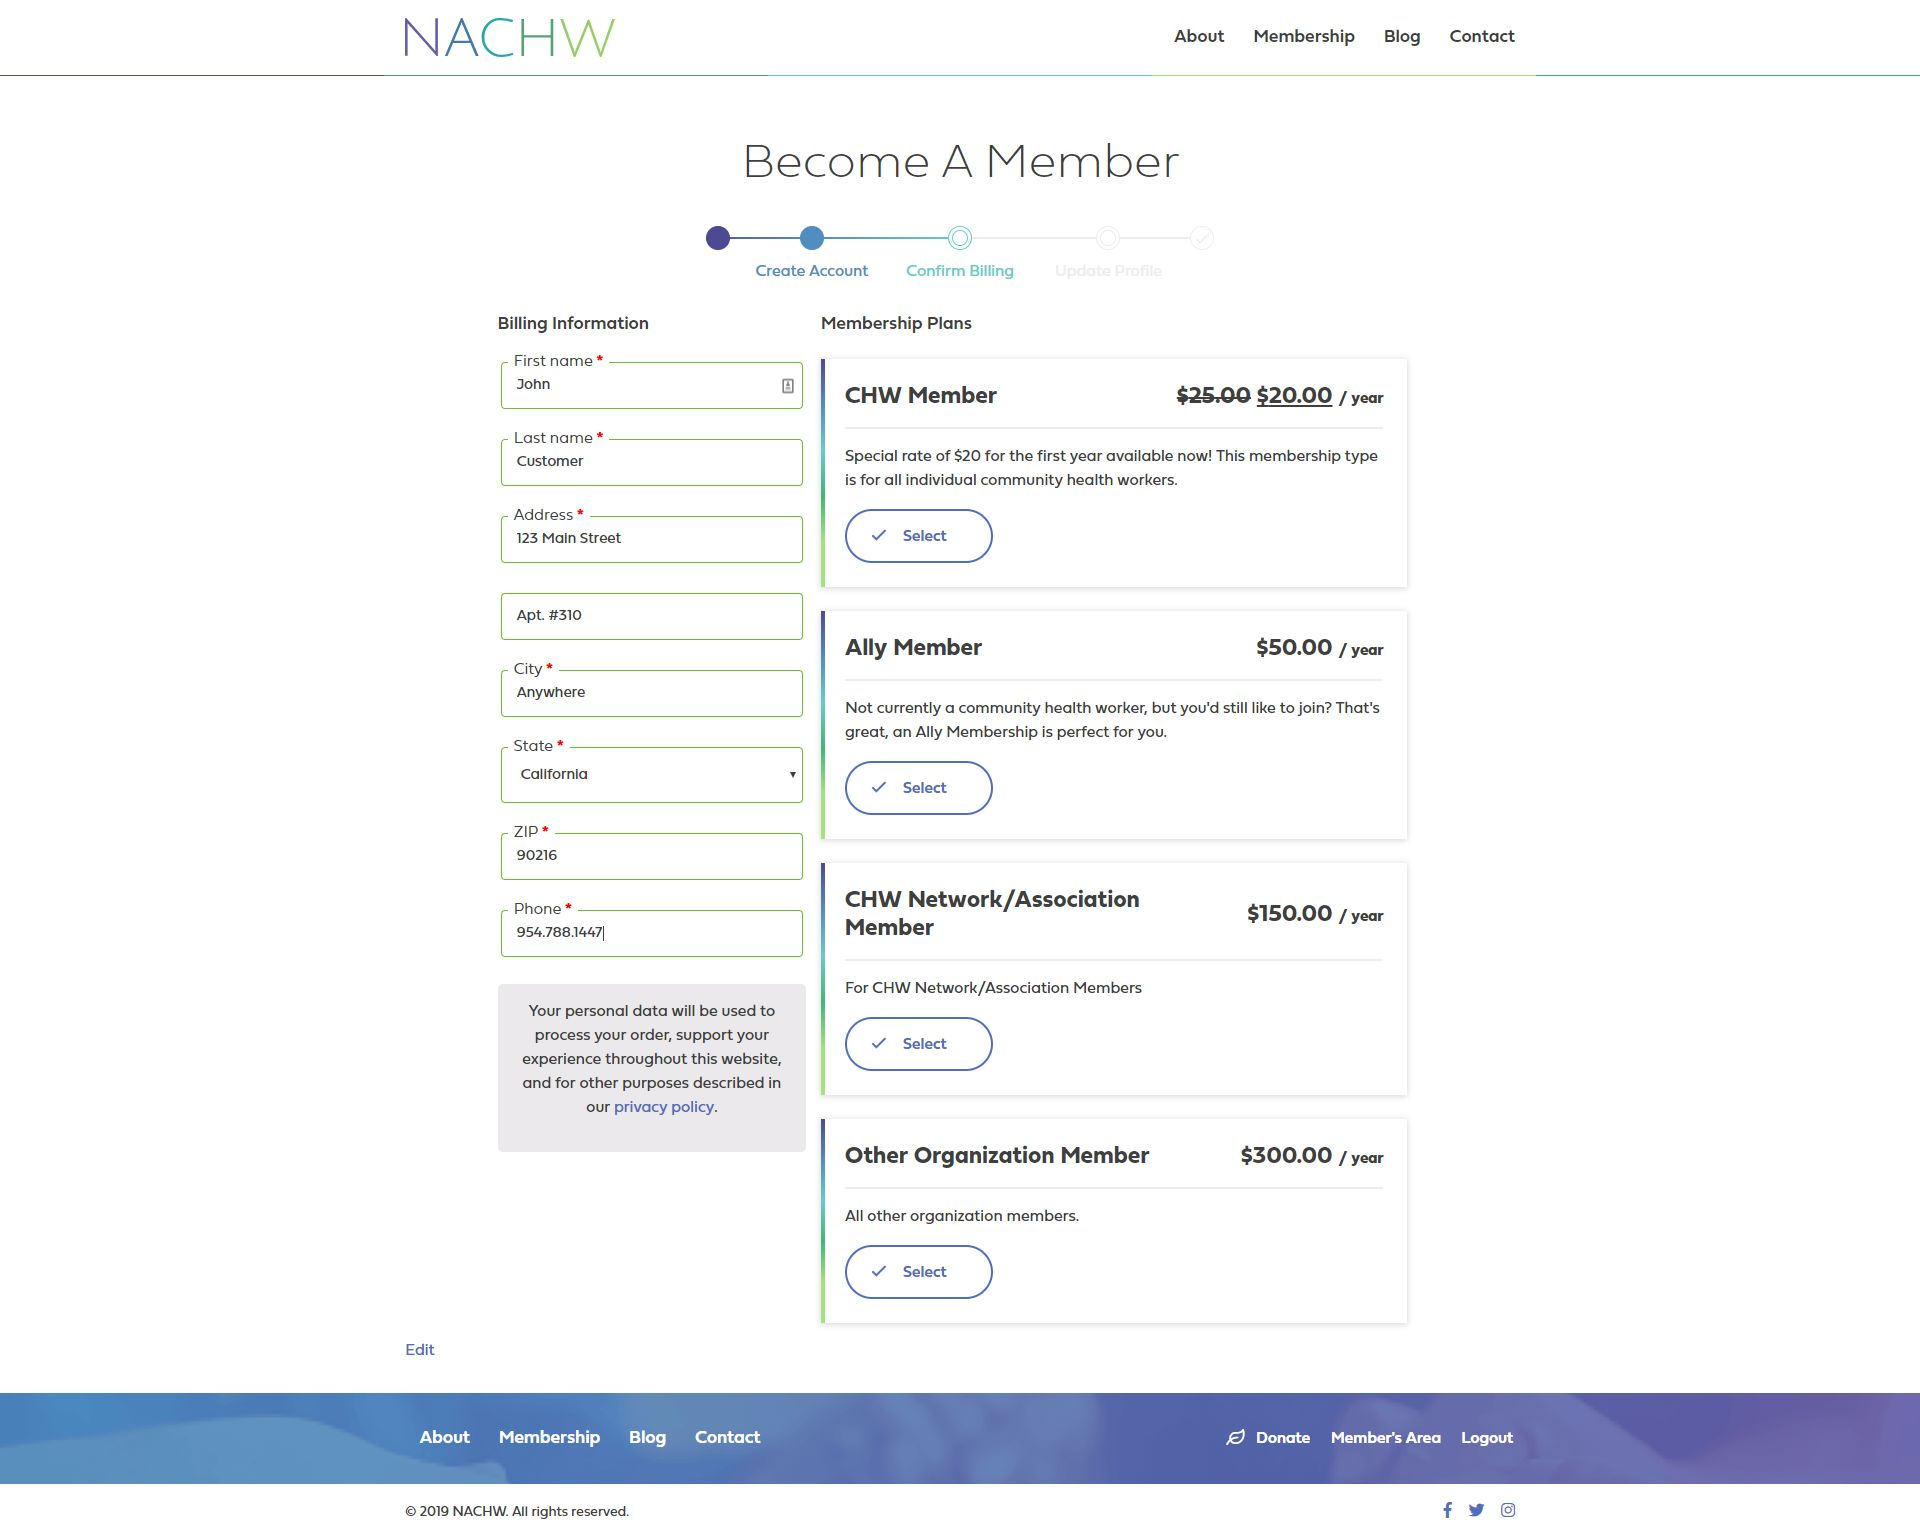 NACHW.org - Checkout